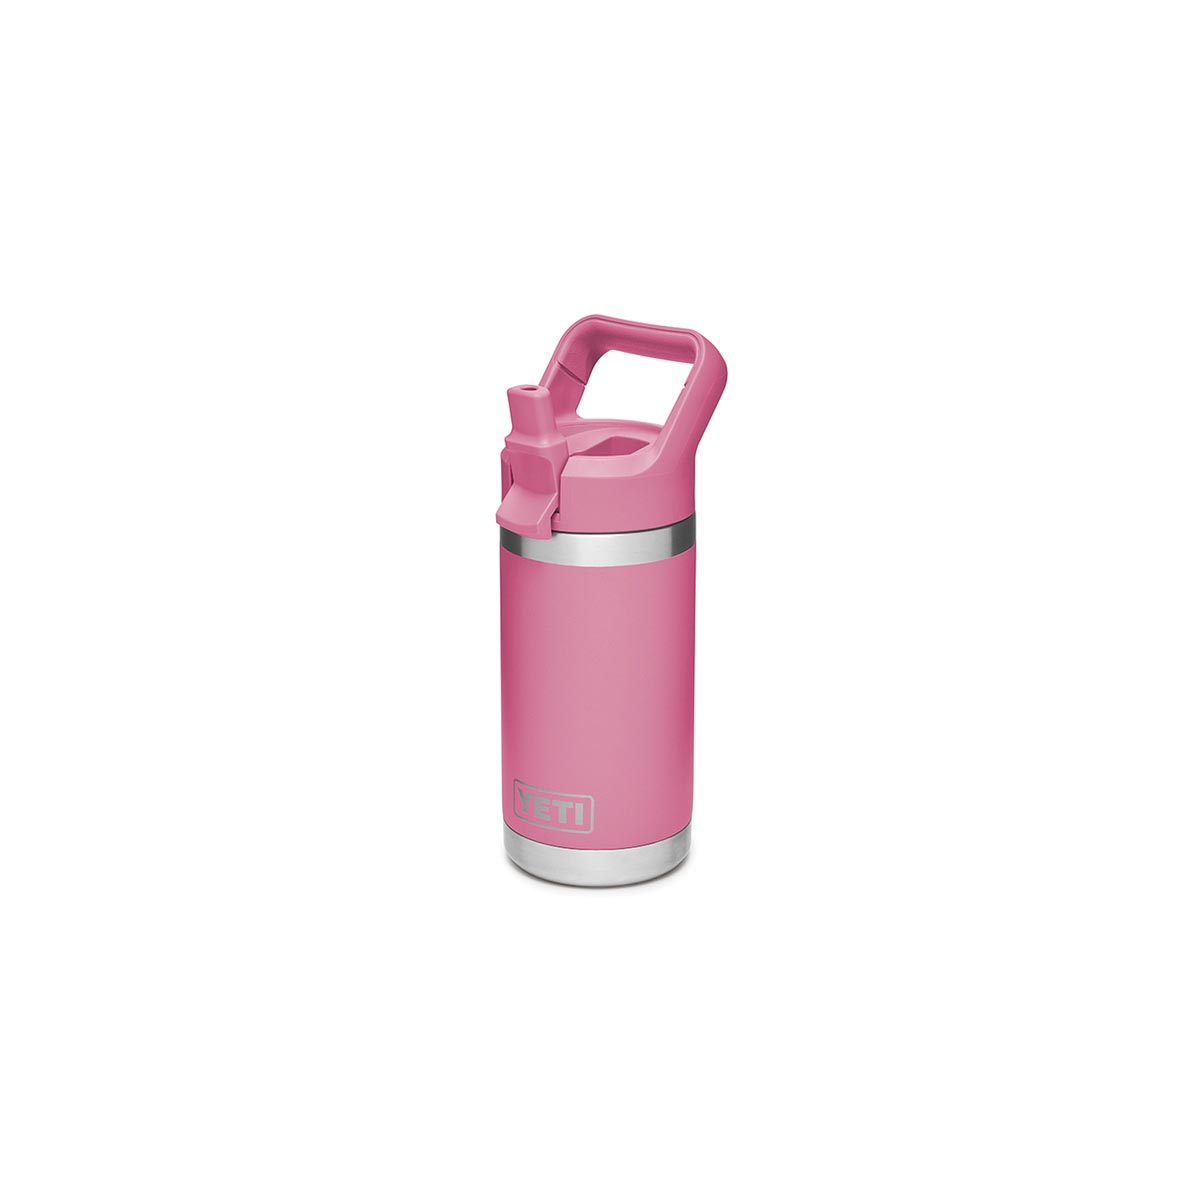 Picture of YETI Rambler Jr 21071500109 Kid's Bottle, 12 oz Capacity, Stainless Steel, Harbor Pink